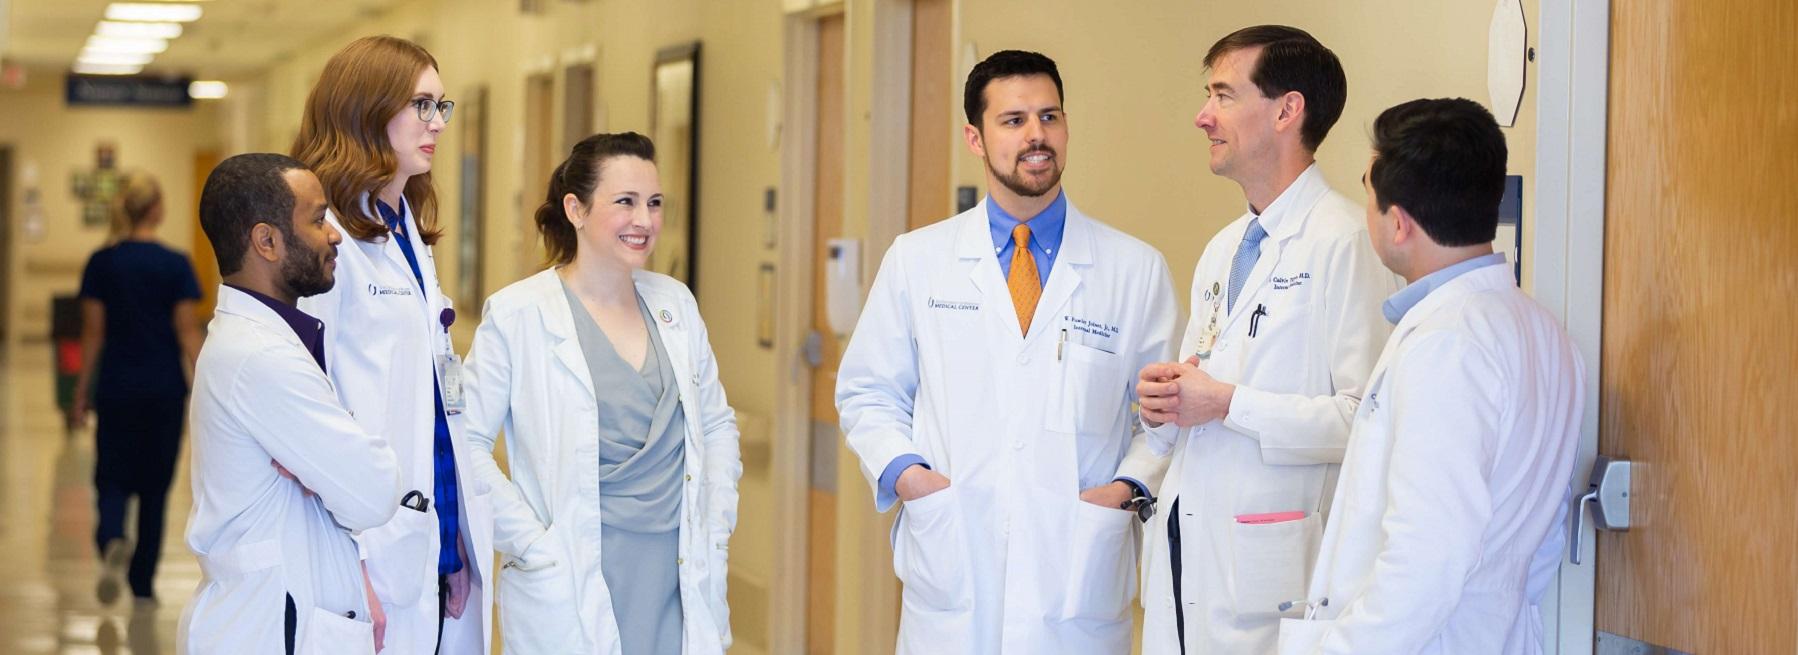 About Our Program - University of Mississippi Medical Center